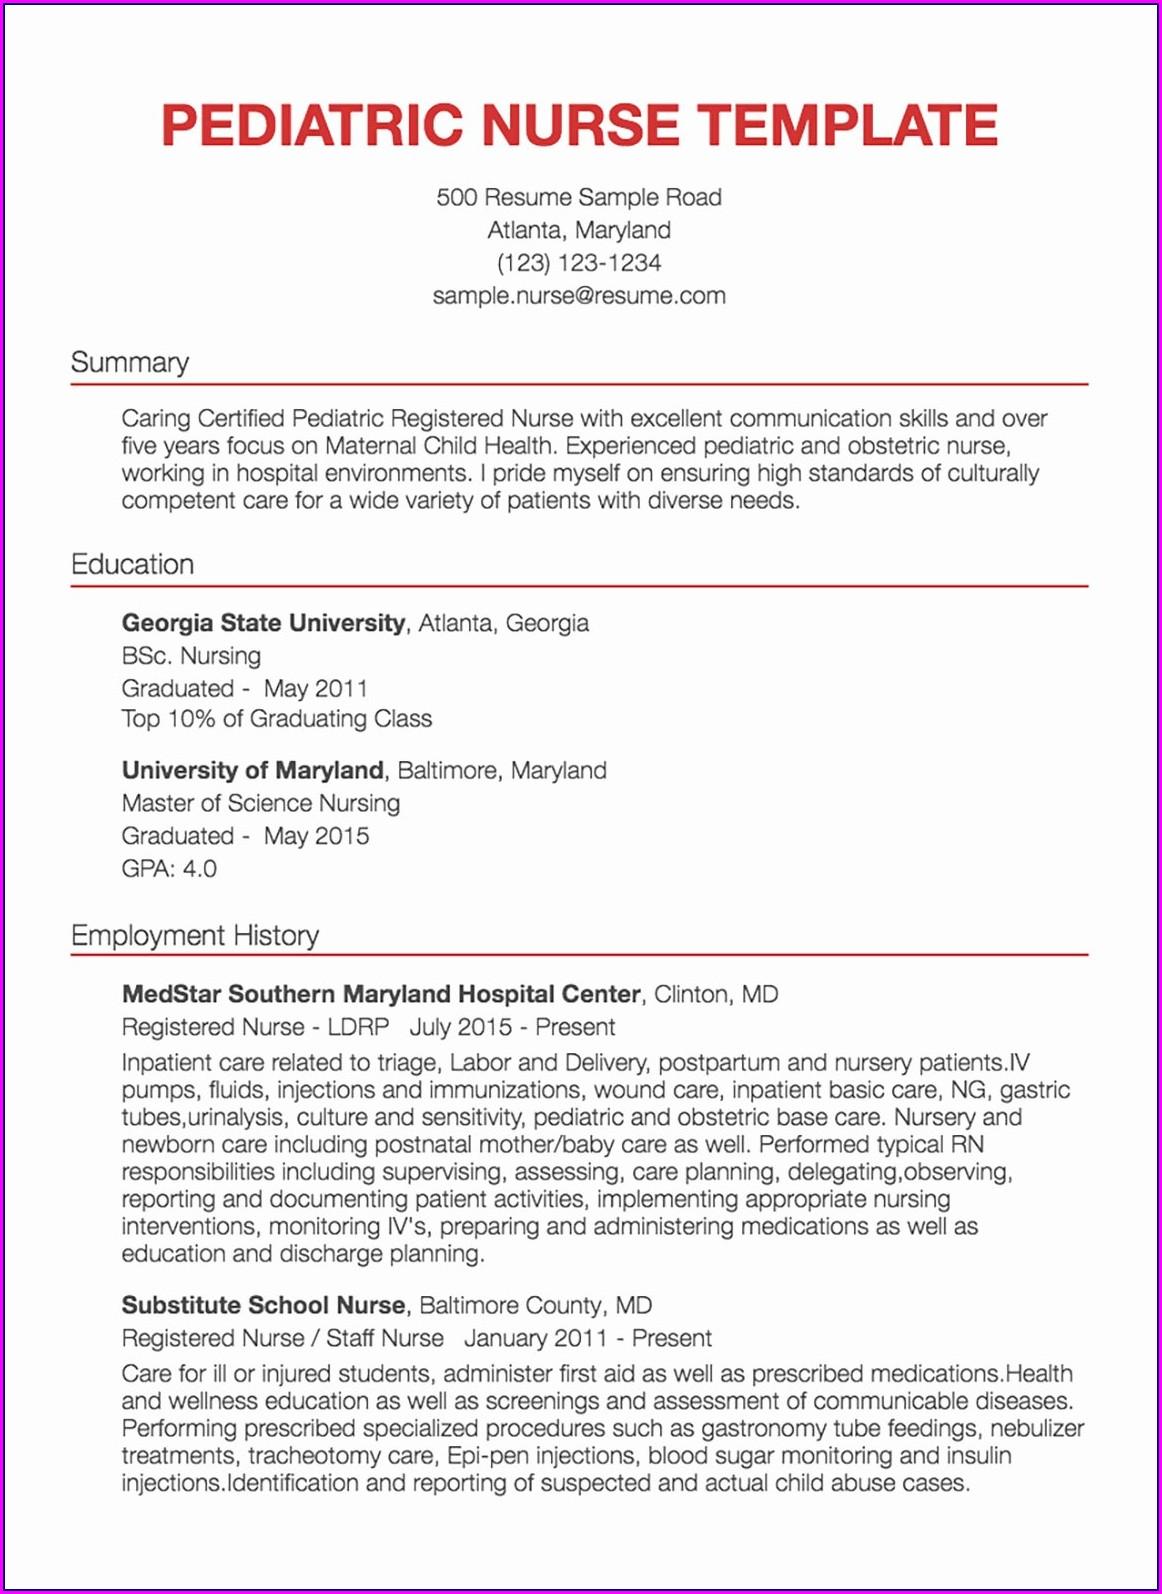 Sample Resume For Experienced Registered Nurse